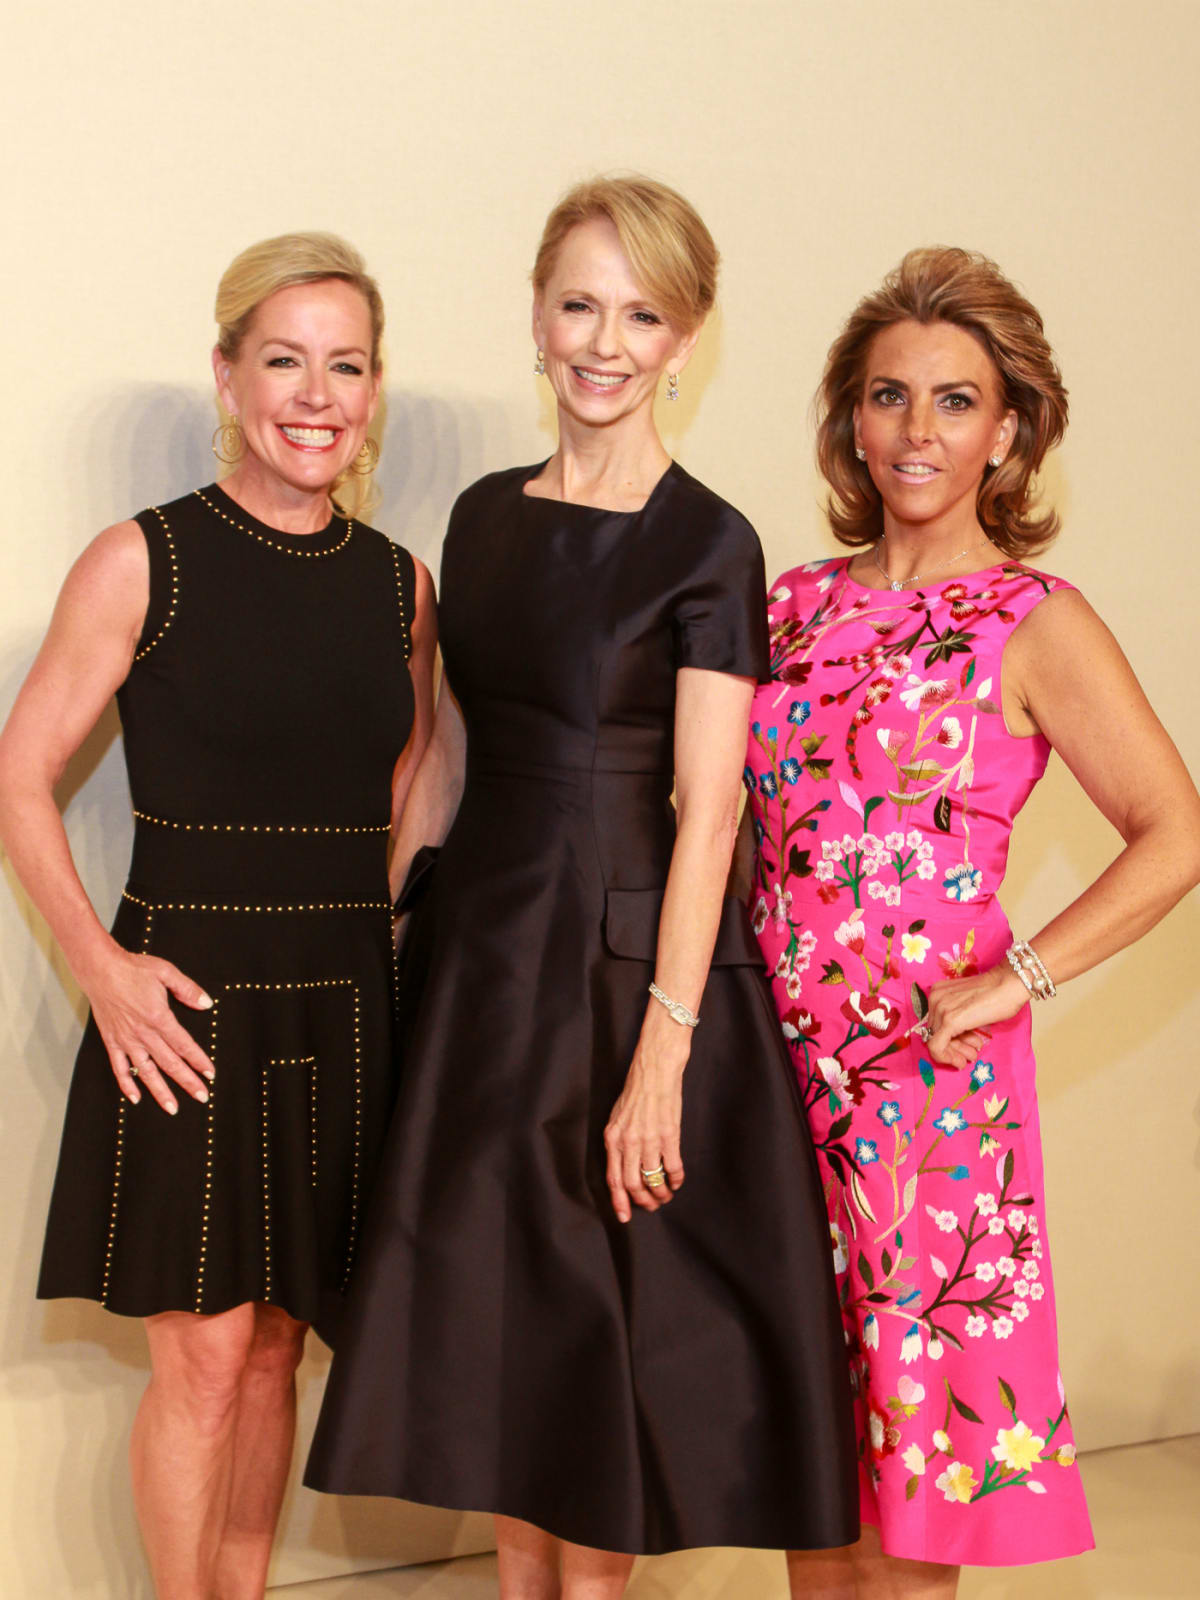 Best Dressed Luncheon, March 2016, Rosemary Schatzman, Susan Sarofim, Mary Tere Perusquia